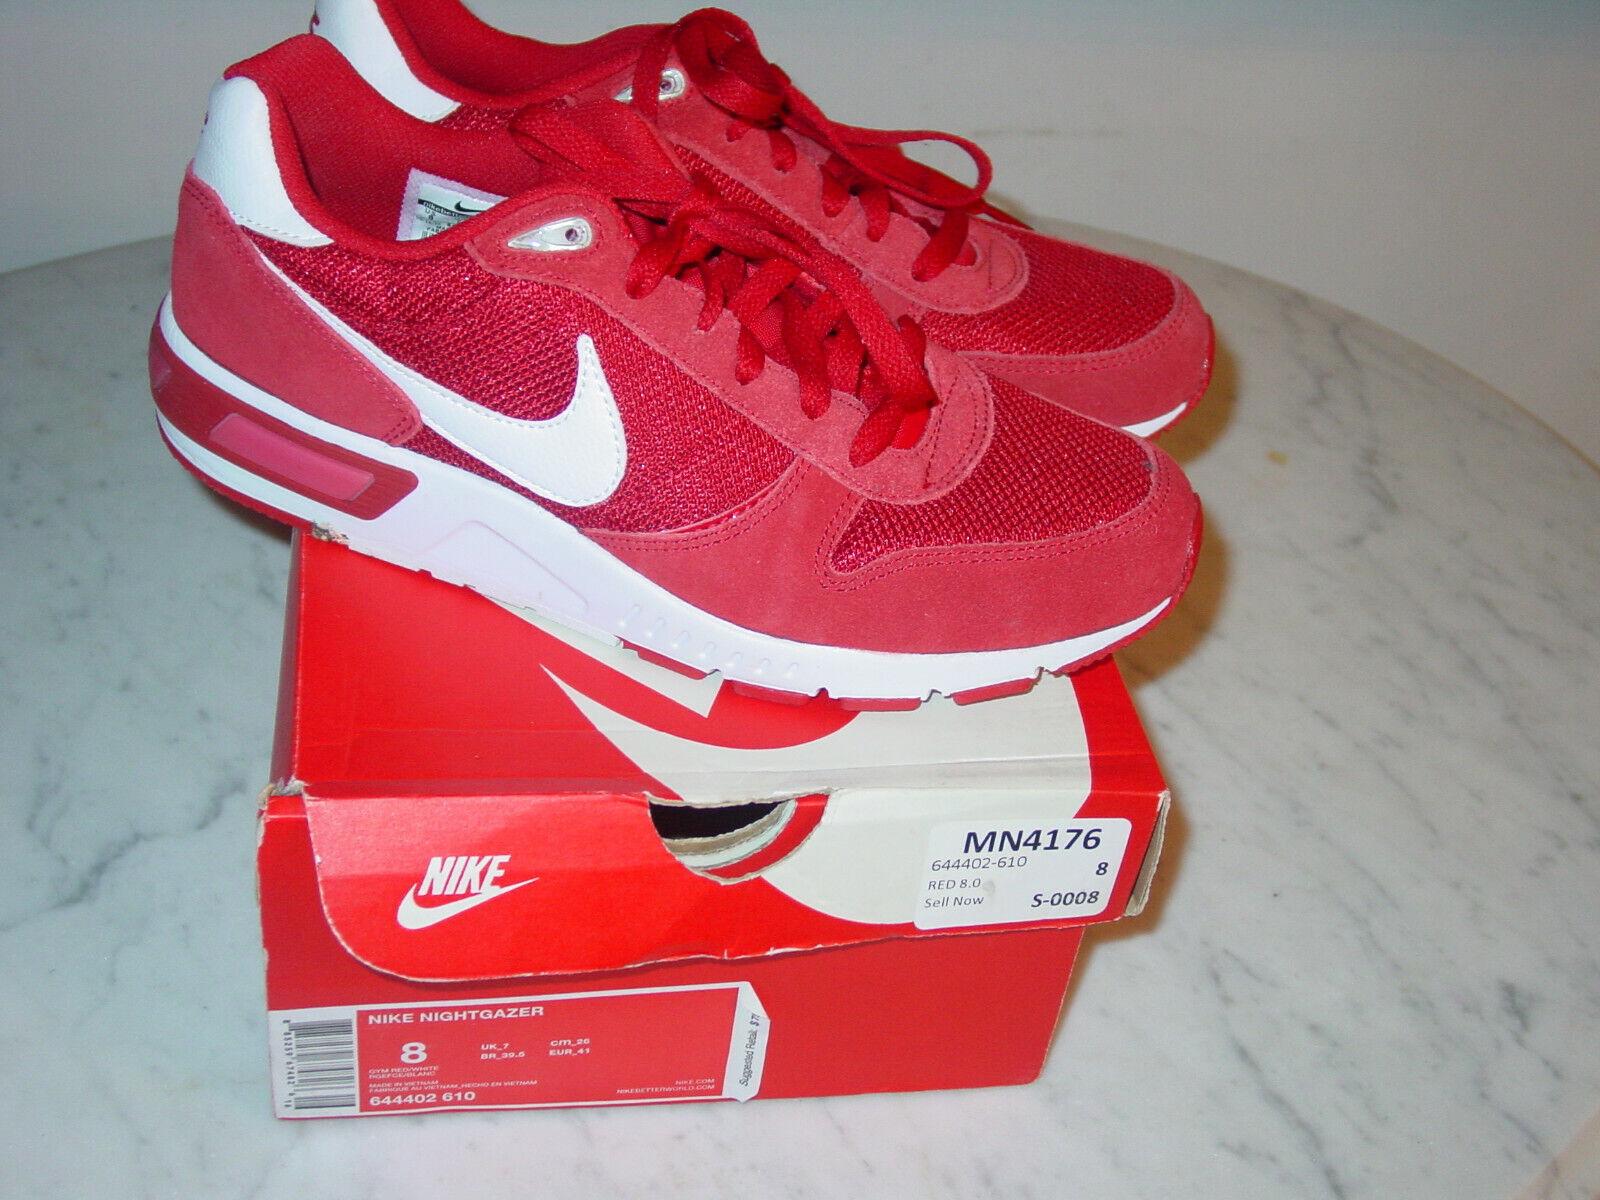 2014 Mens Nike Nike Nike Nightgazer Gym Red White Running shoes  Size 8 w Box  2d0cc4